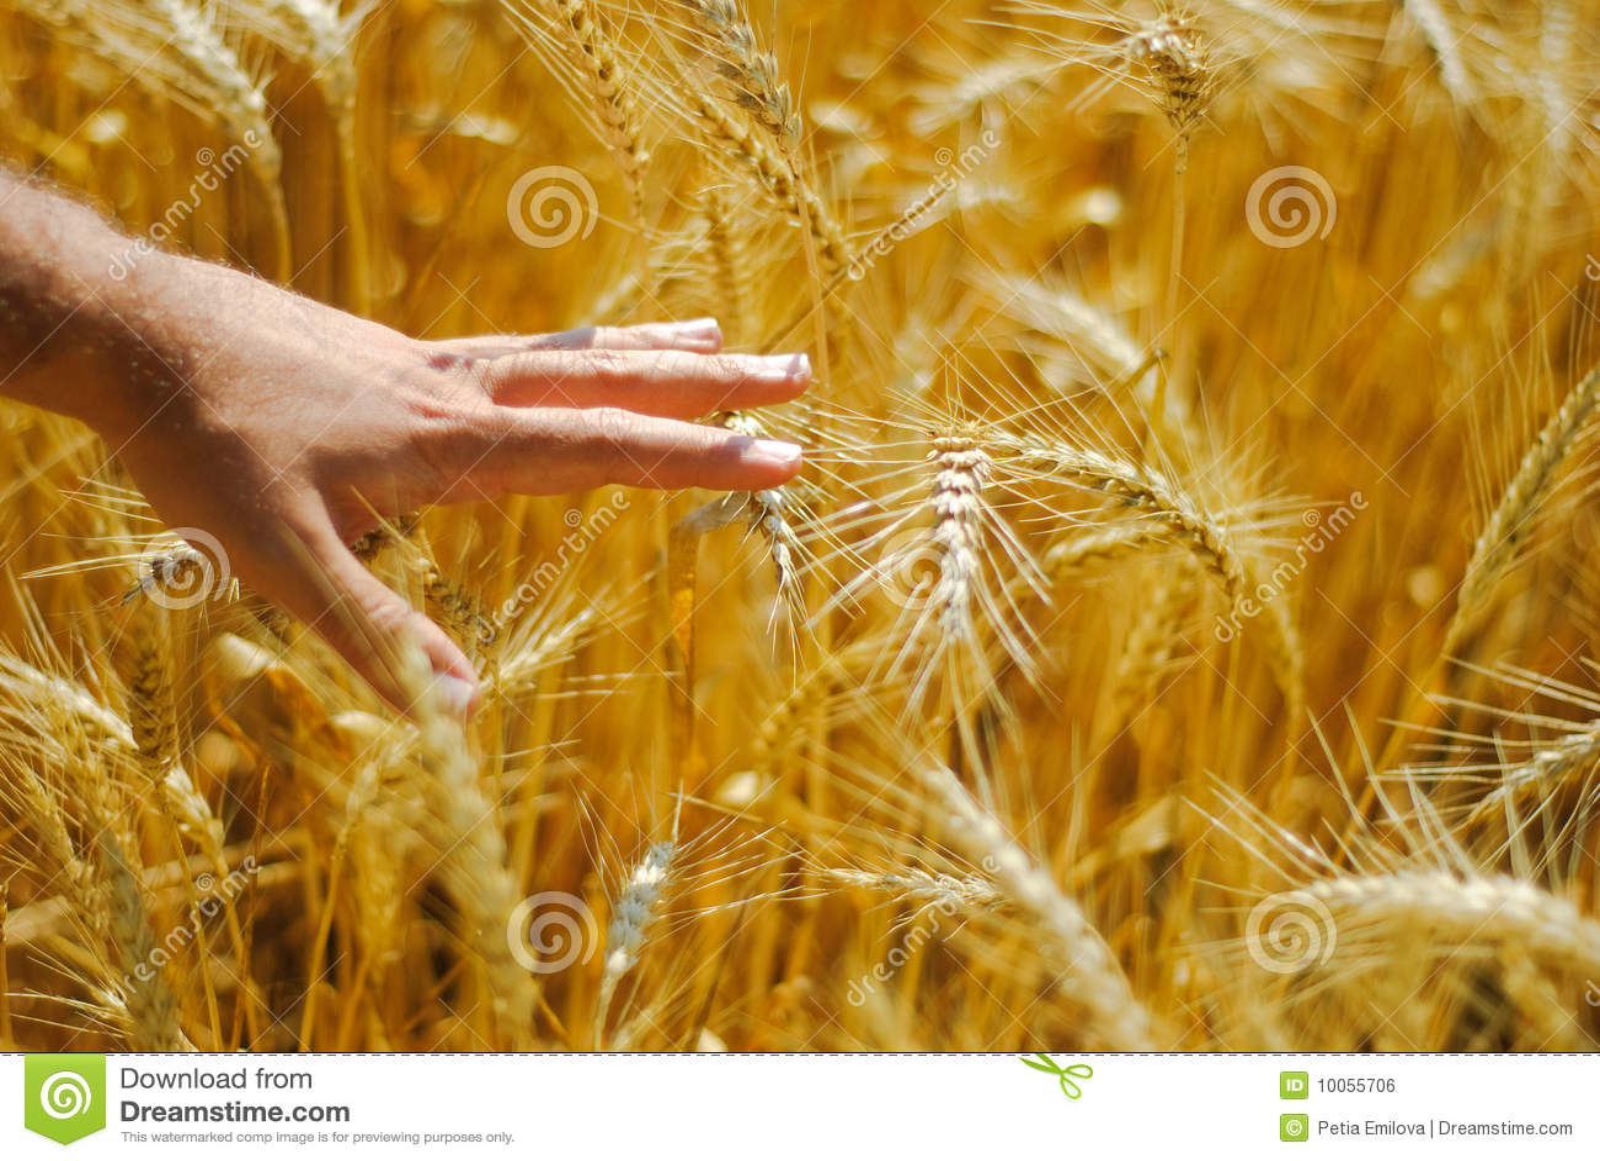 Mão masculina no corn-field